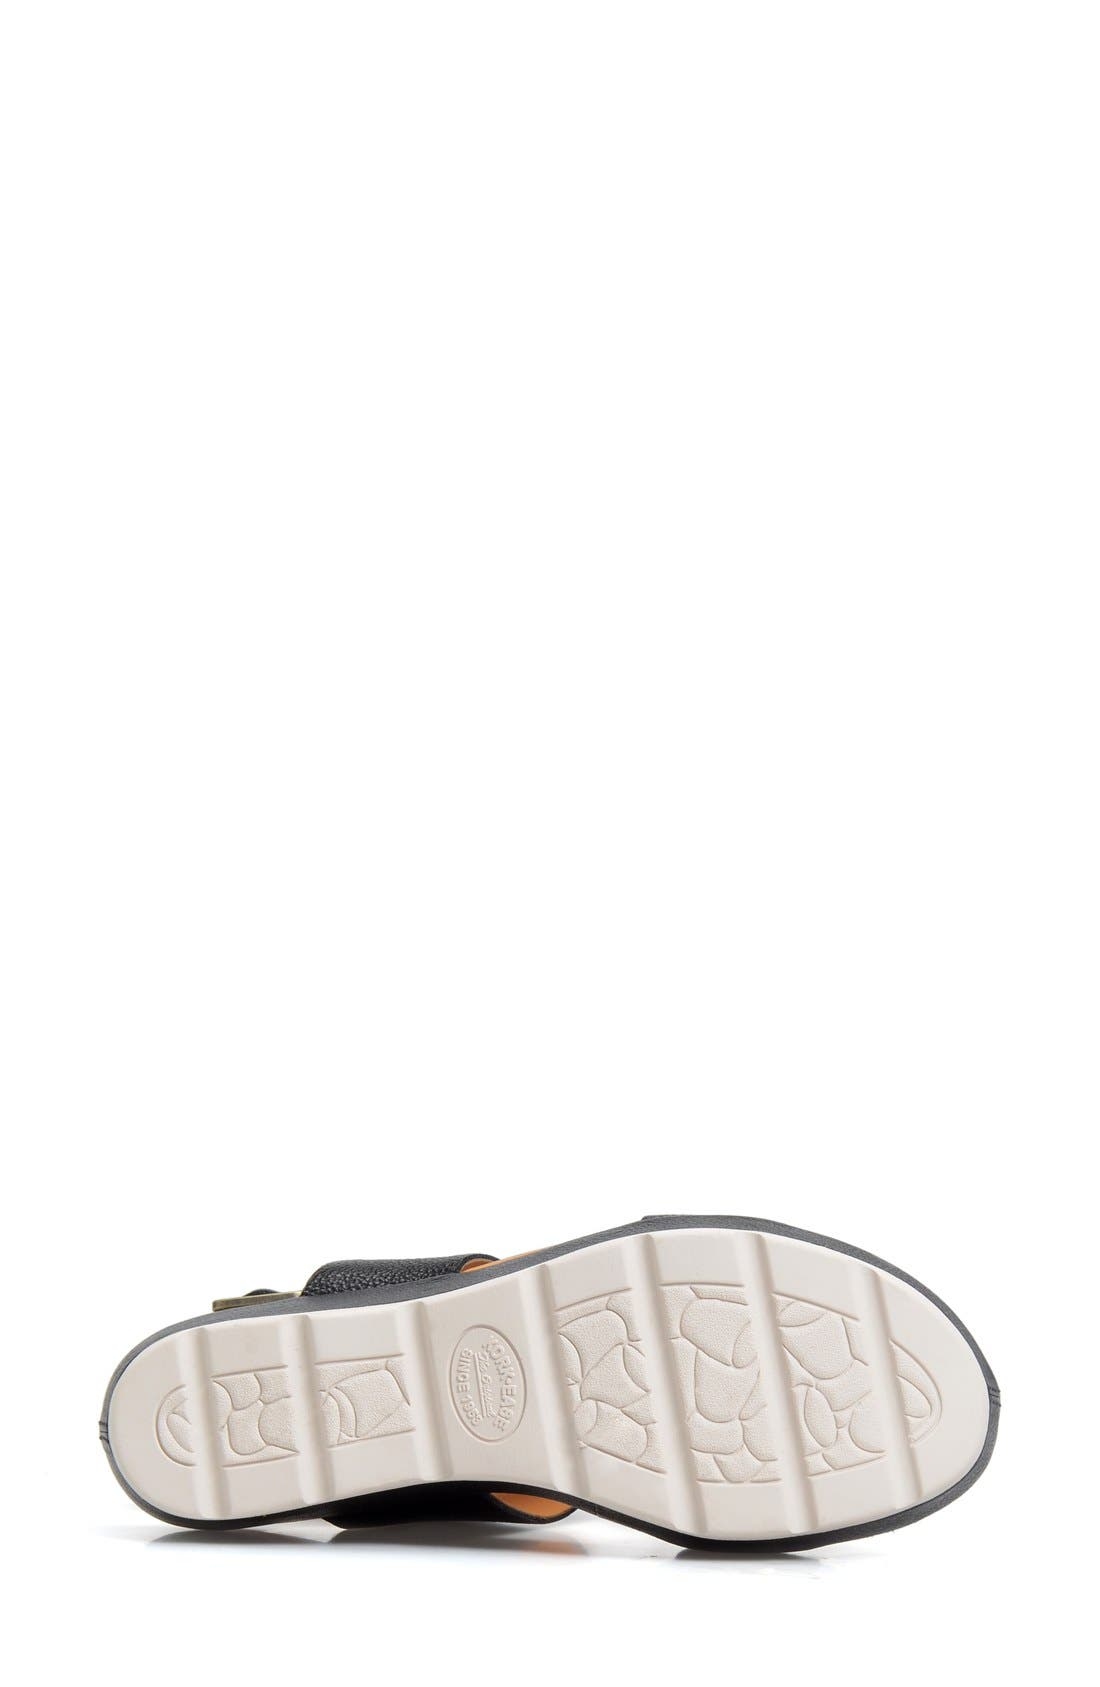 'Khloe' Platform Wedge Sandal,                             Alternate thumbnail 16, color,